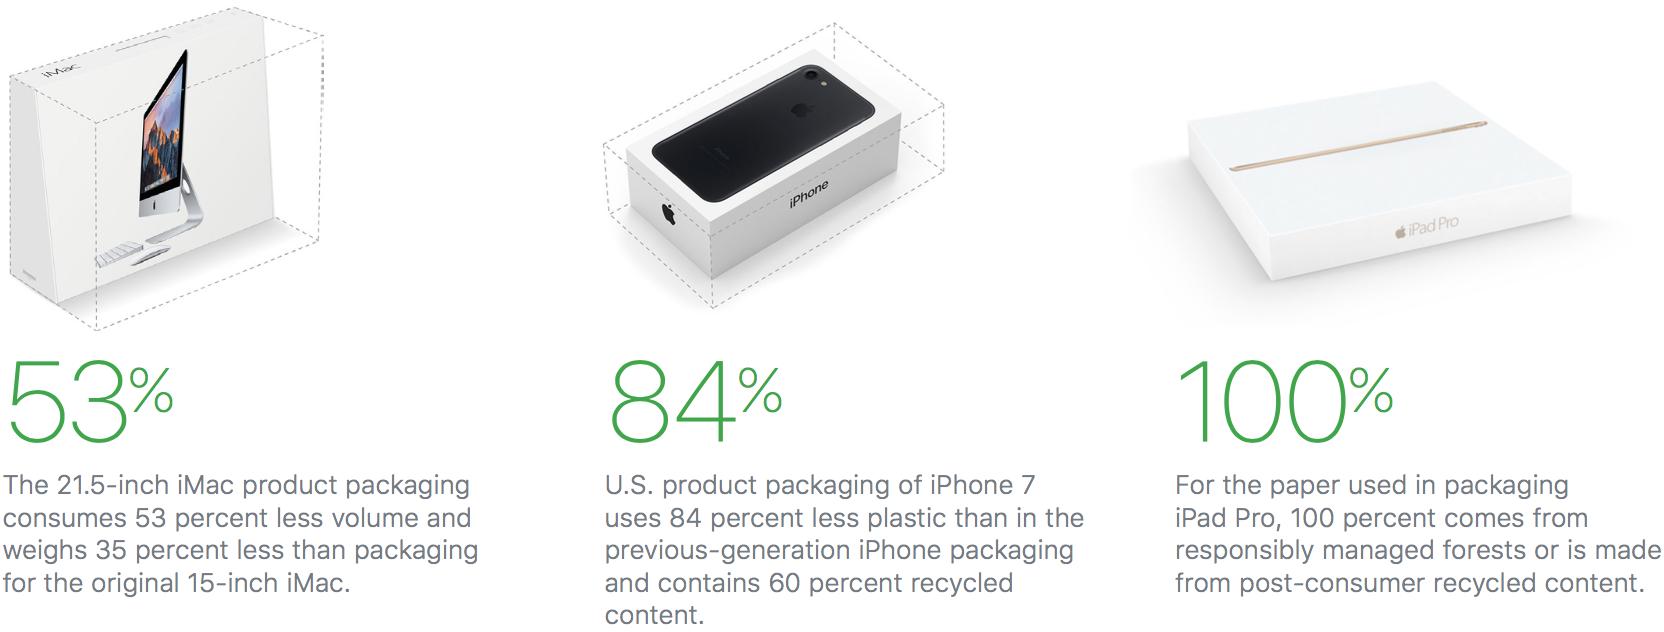 apple papiergebruik 2017